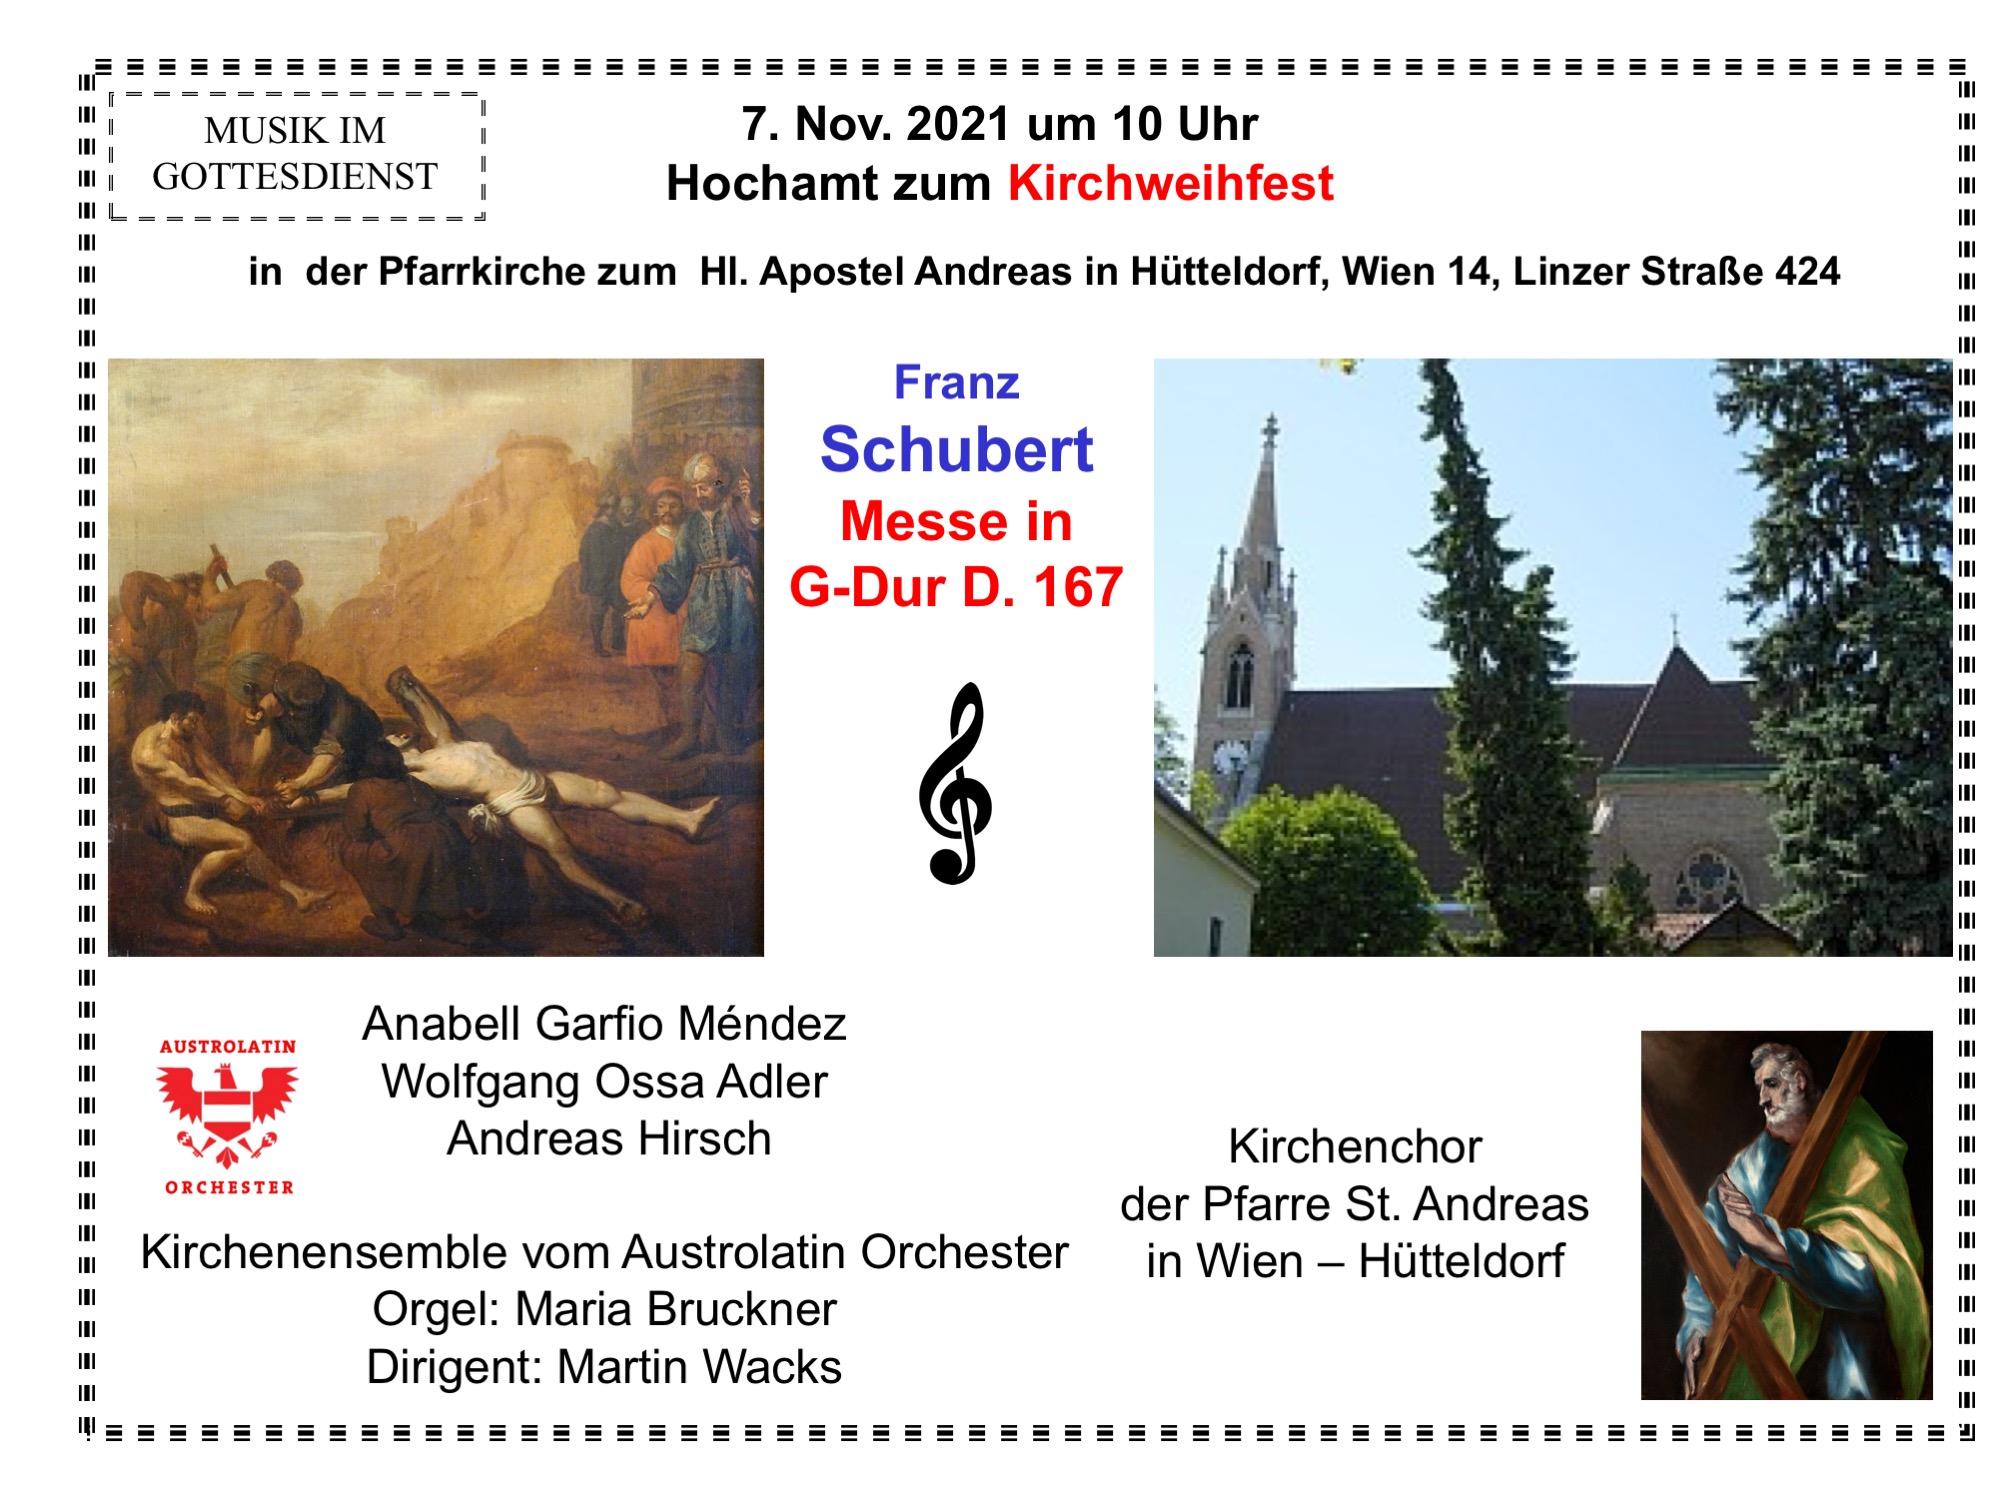 Schubert: Messe in G-Dur